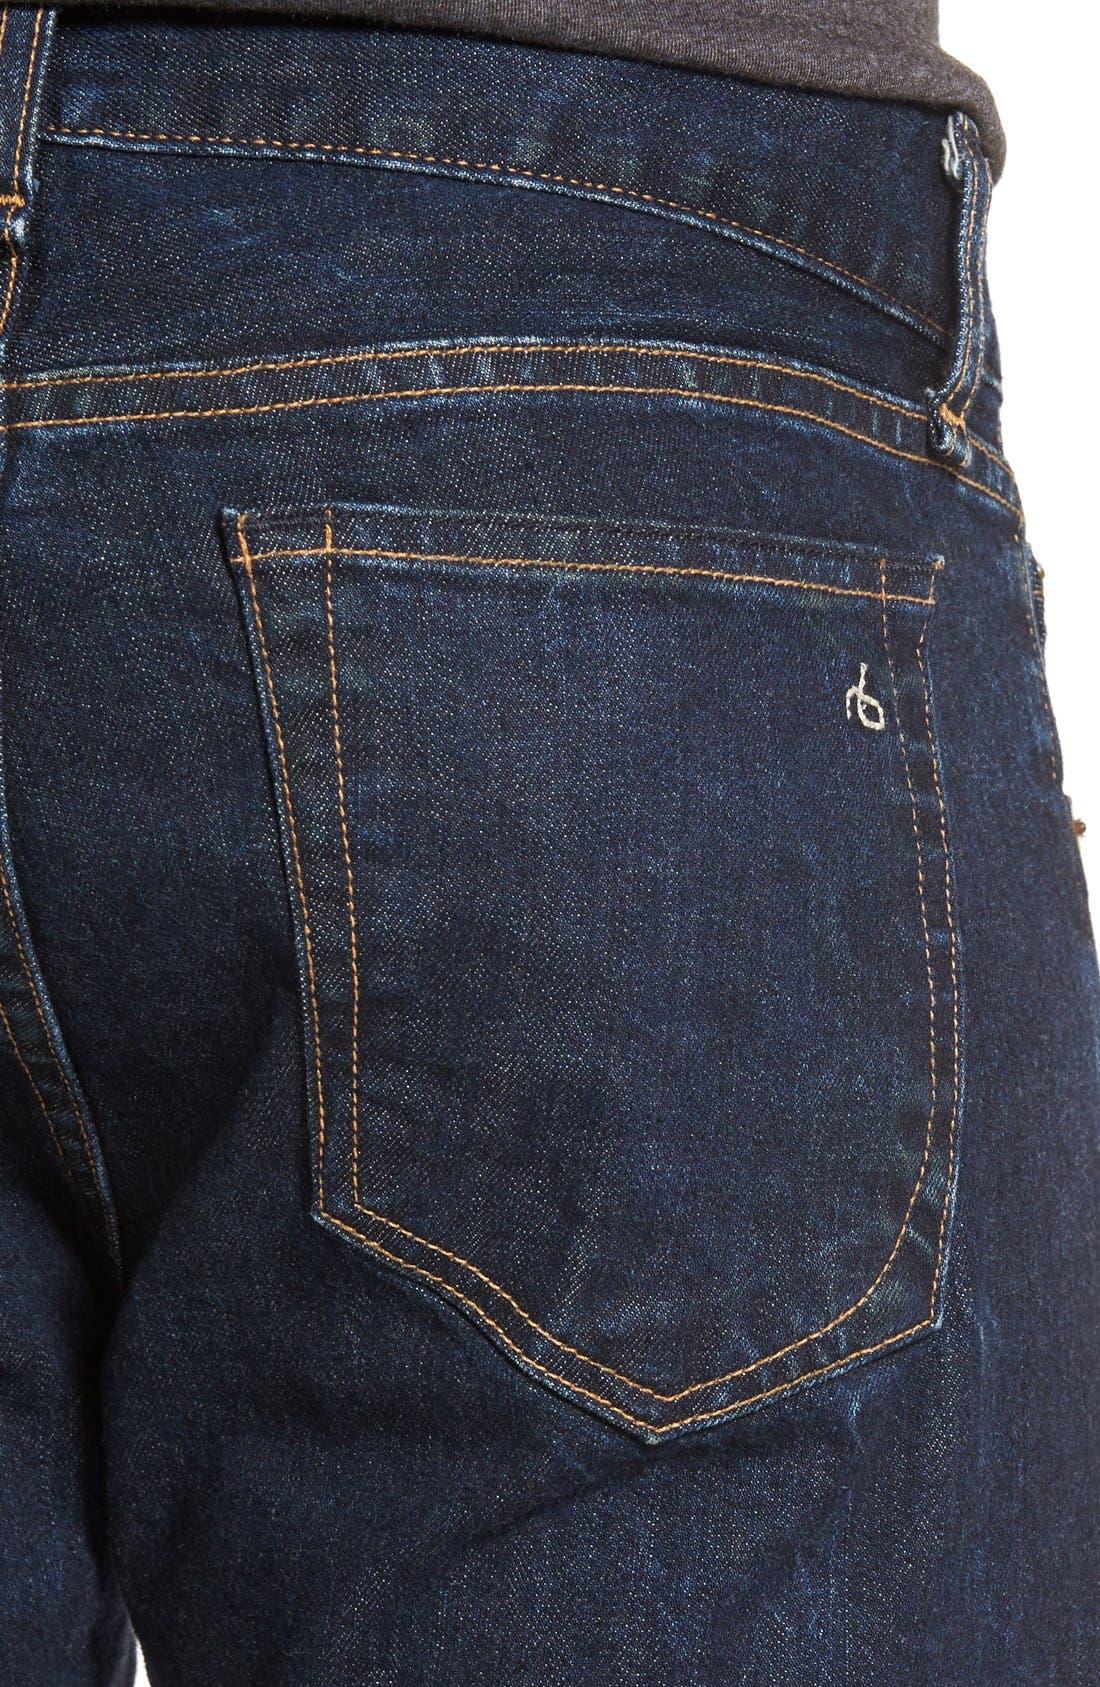 RAG & BONE, Standard Issue Fit 3 Slim Straight Leg Jeans, Alternate thumbnail 11, color, HERITAGE